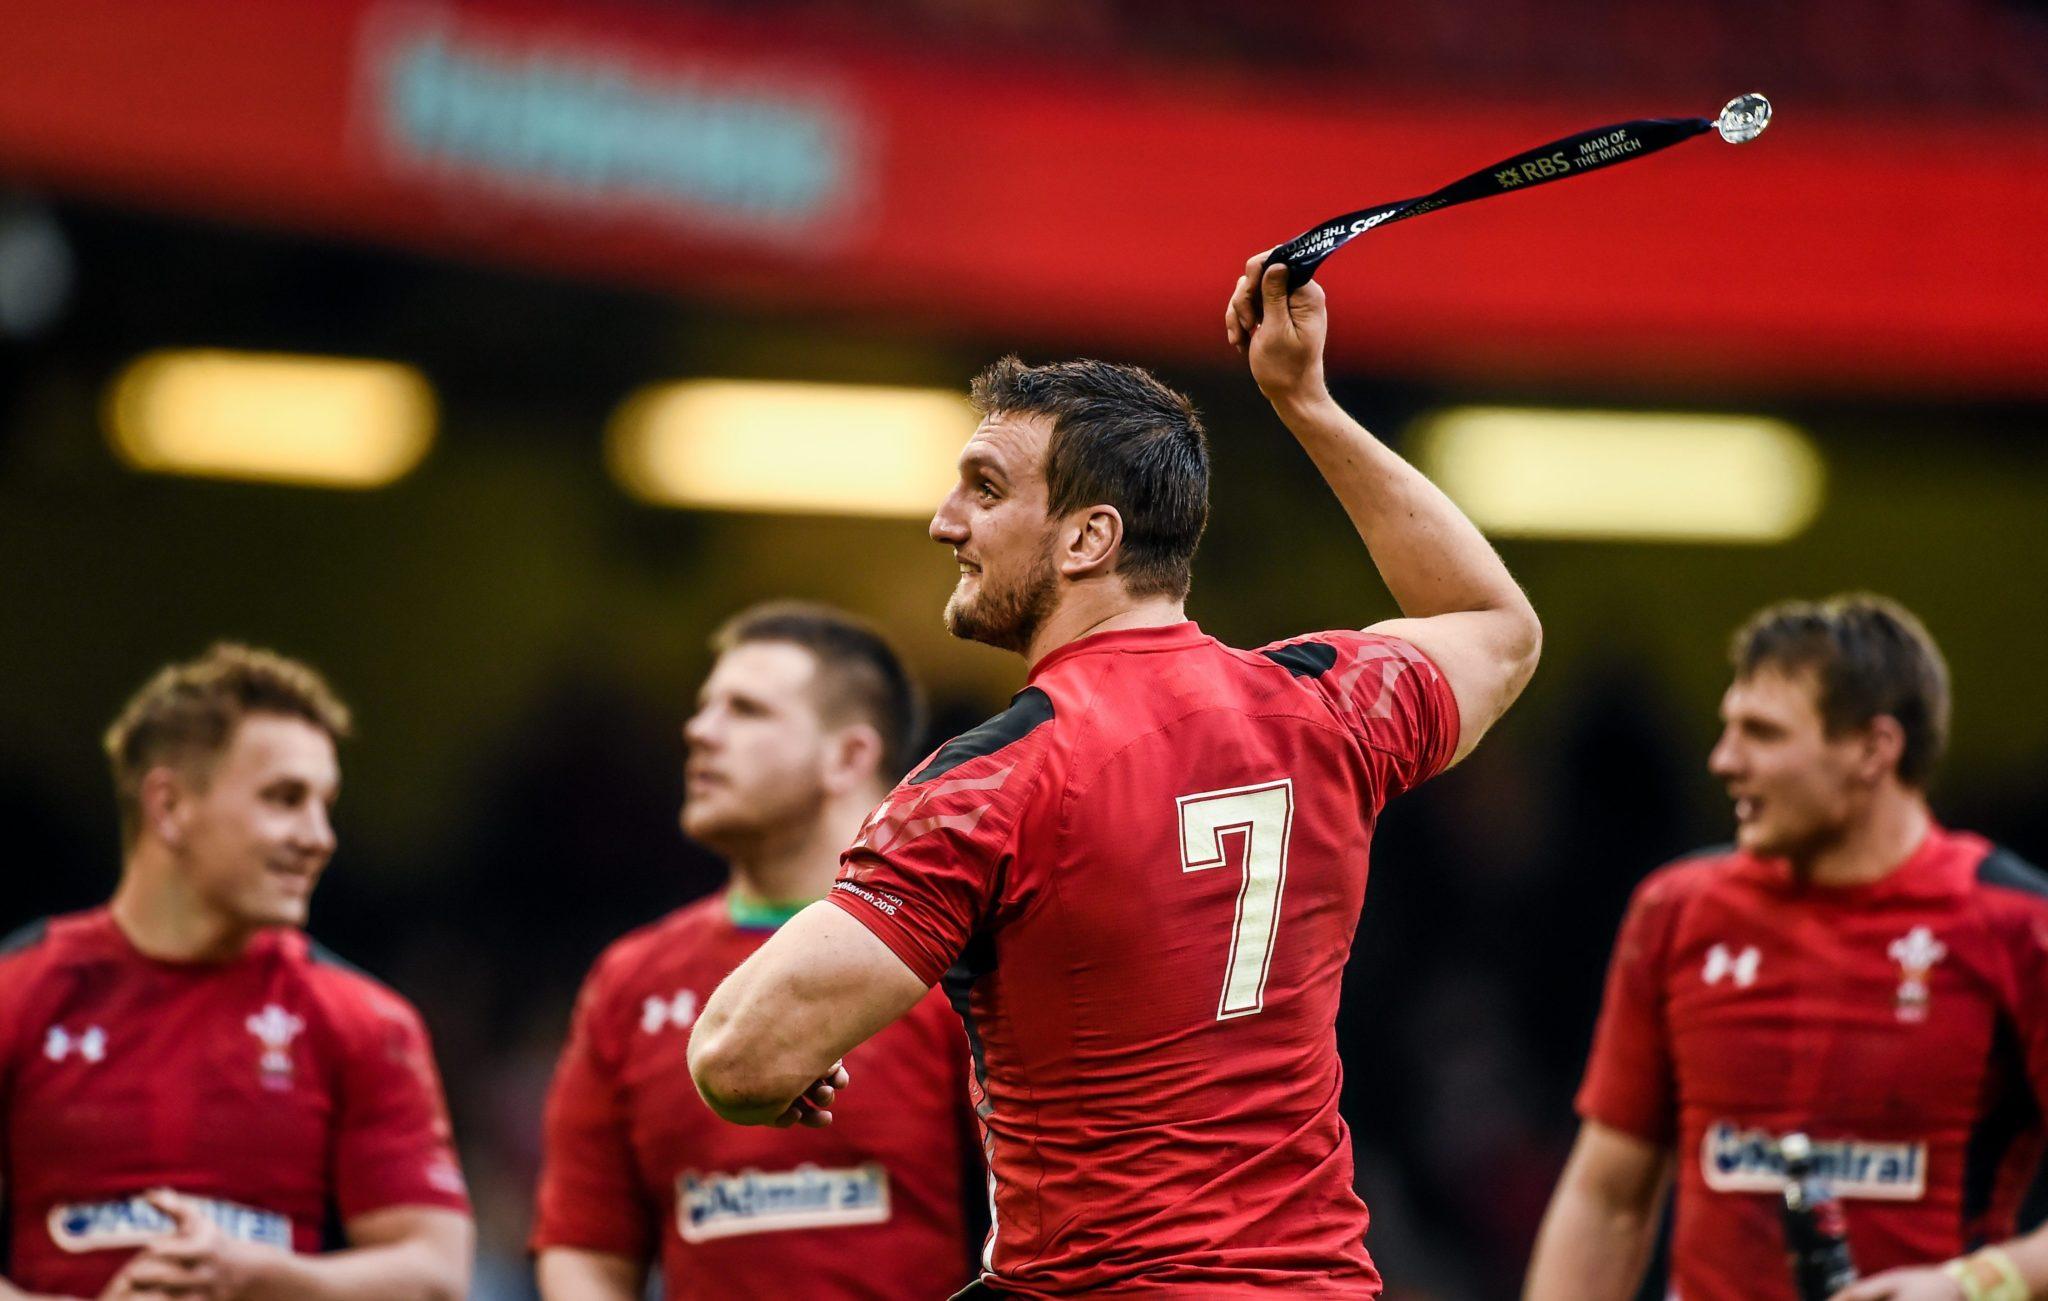 Sam Warburton celebrates against Ireland